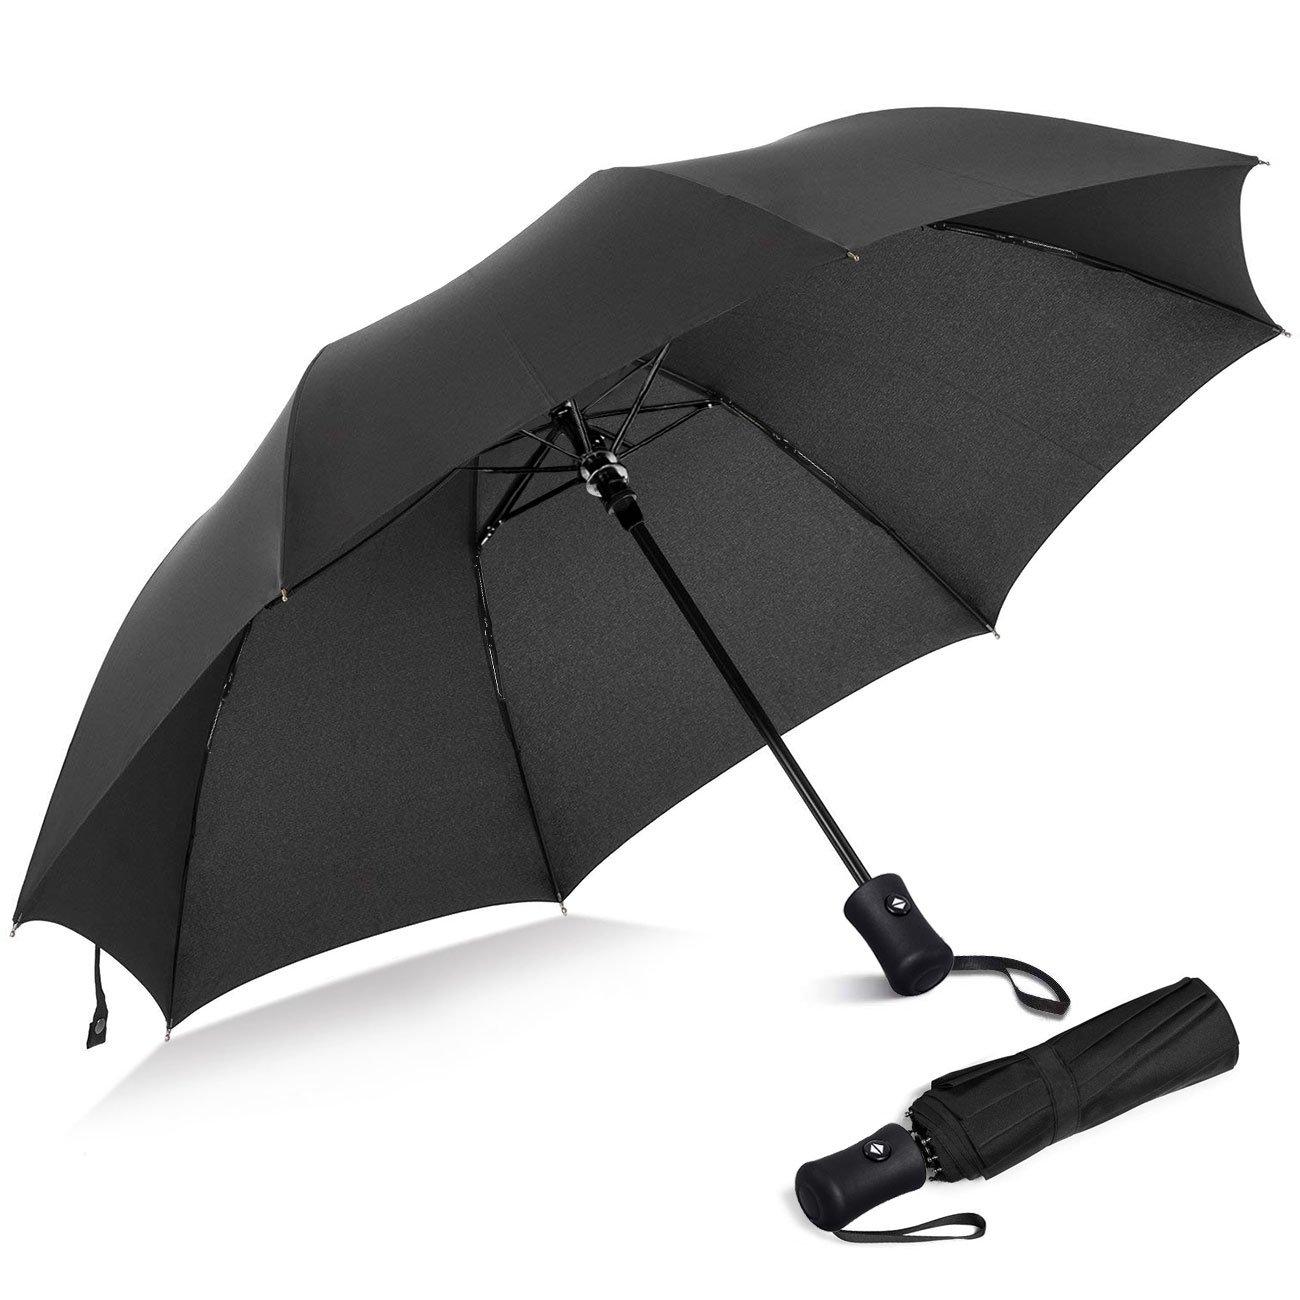 Windproof Compact Light Weight Travel Automatic Open/Close Triple Fold Umbrella